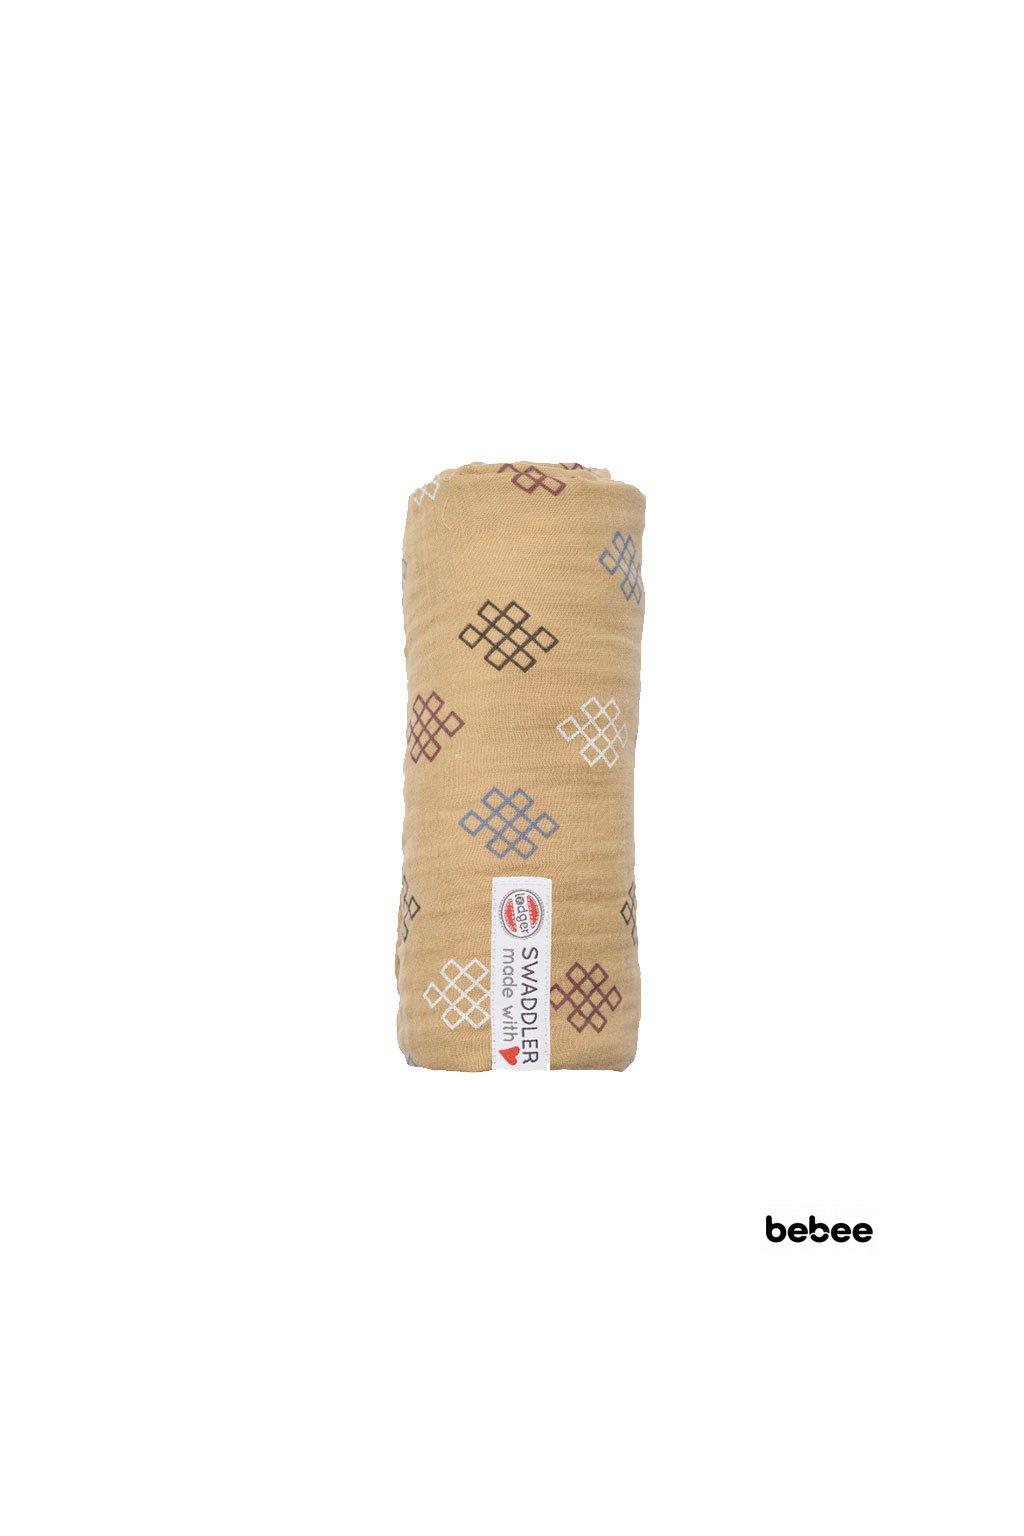 multifunkcna osuska swaddler muslin knot xandu 120 x 120 cm honey lodger